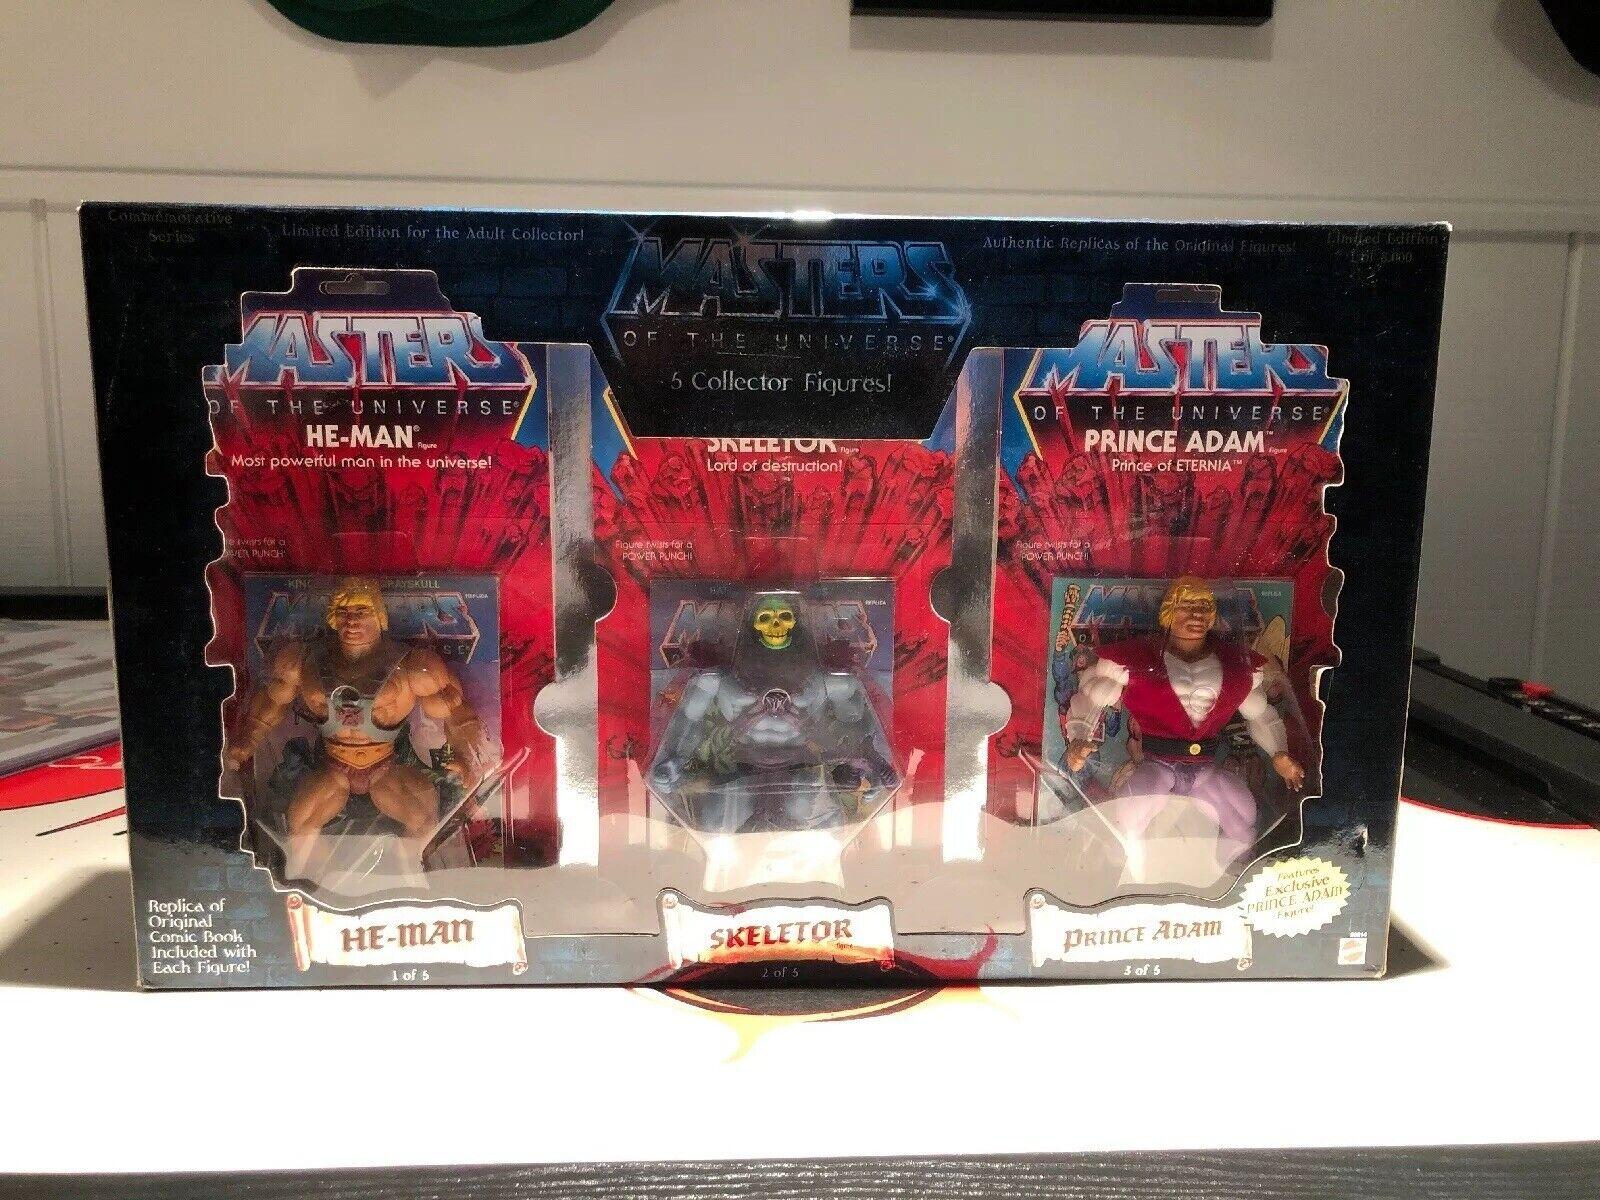 Masters Of The Universe He-Man - Set 1 of 8000 - Skeletor Beast Man - RARE